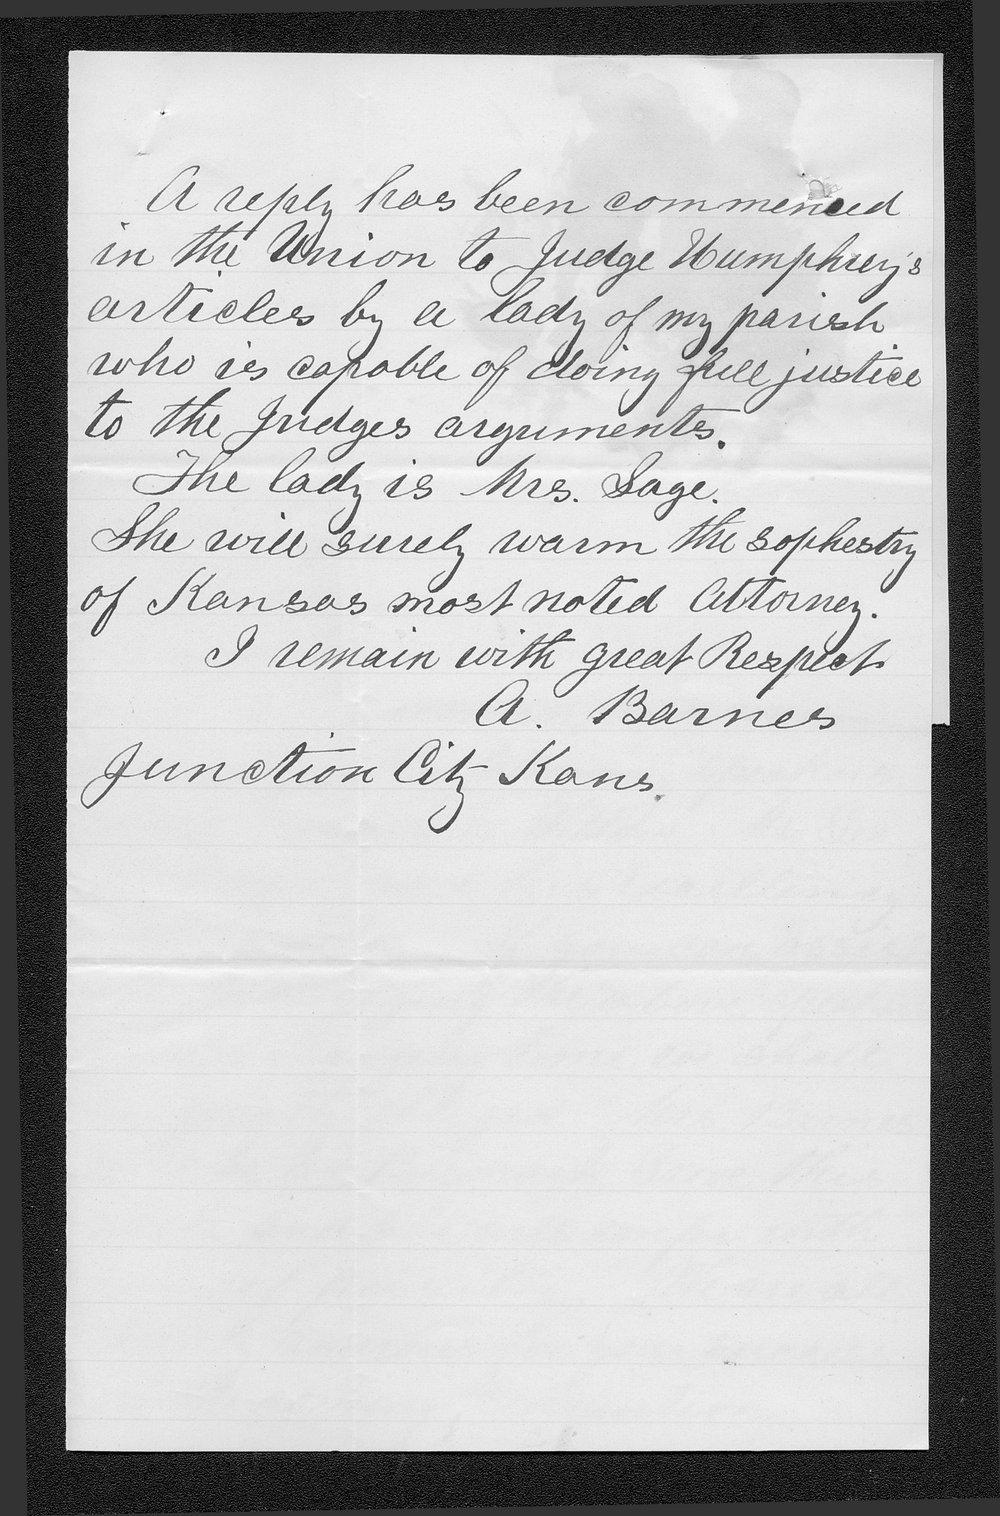 A. Barnes to Governor John St. John - 2